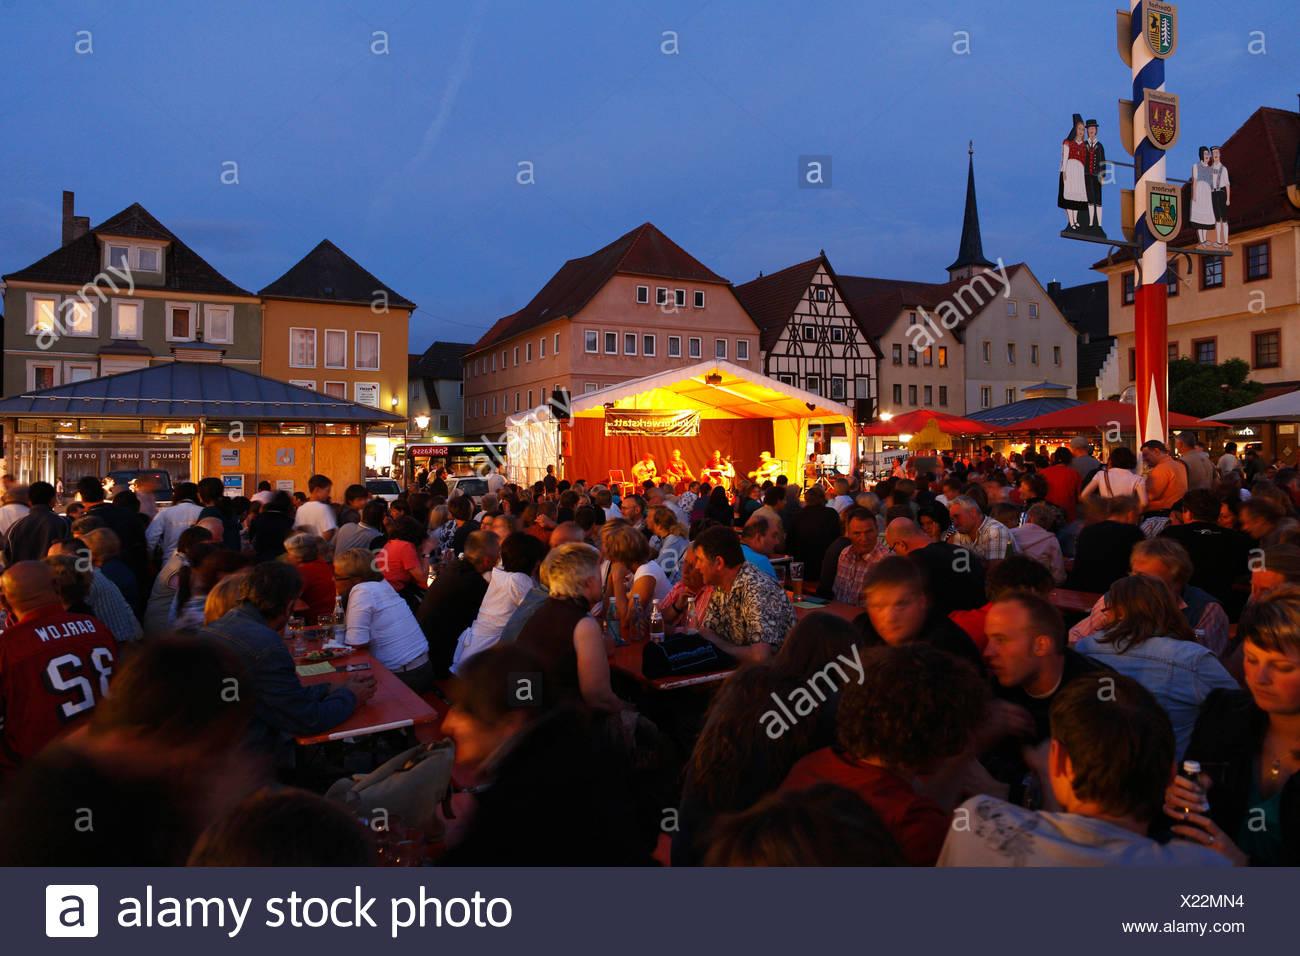 Market square summer Thursday night concerts, Bad Neustadt an der Saale, Rhoen-Grabfeld, Lower Franconia, Bavaria, Germany, Eur - Stock Image